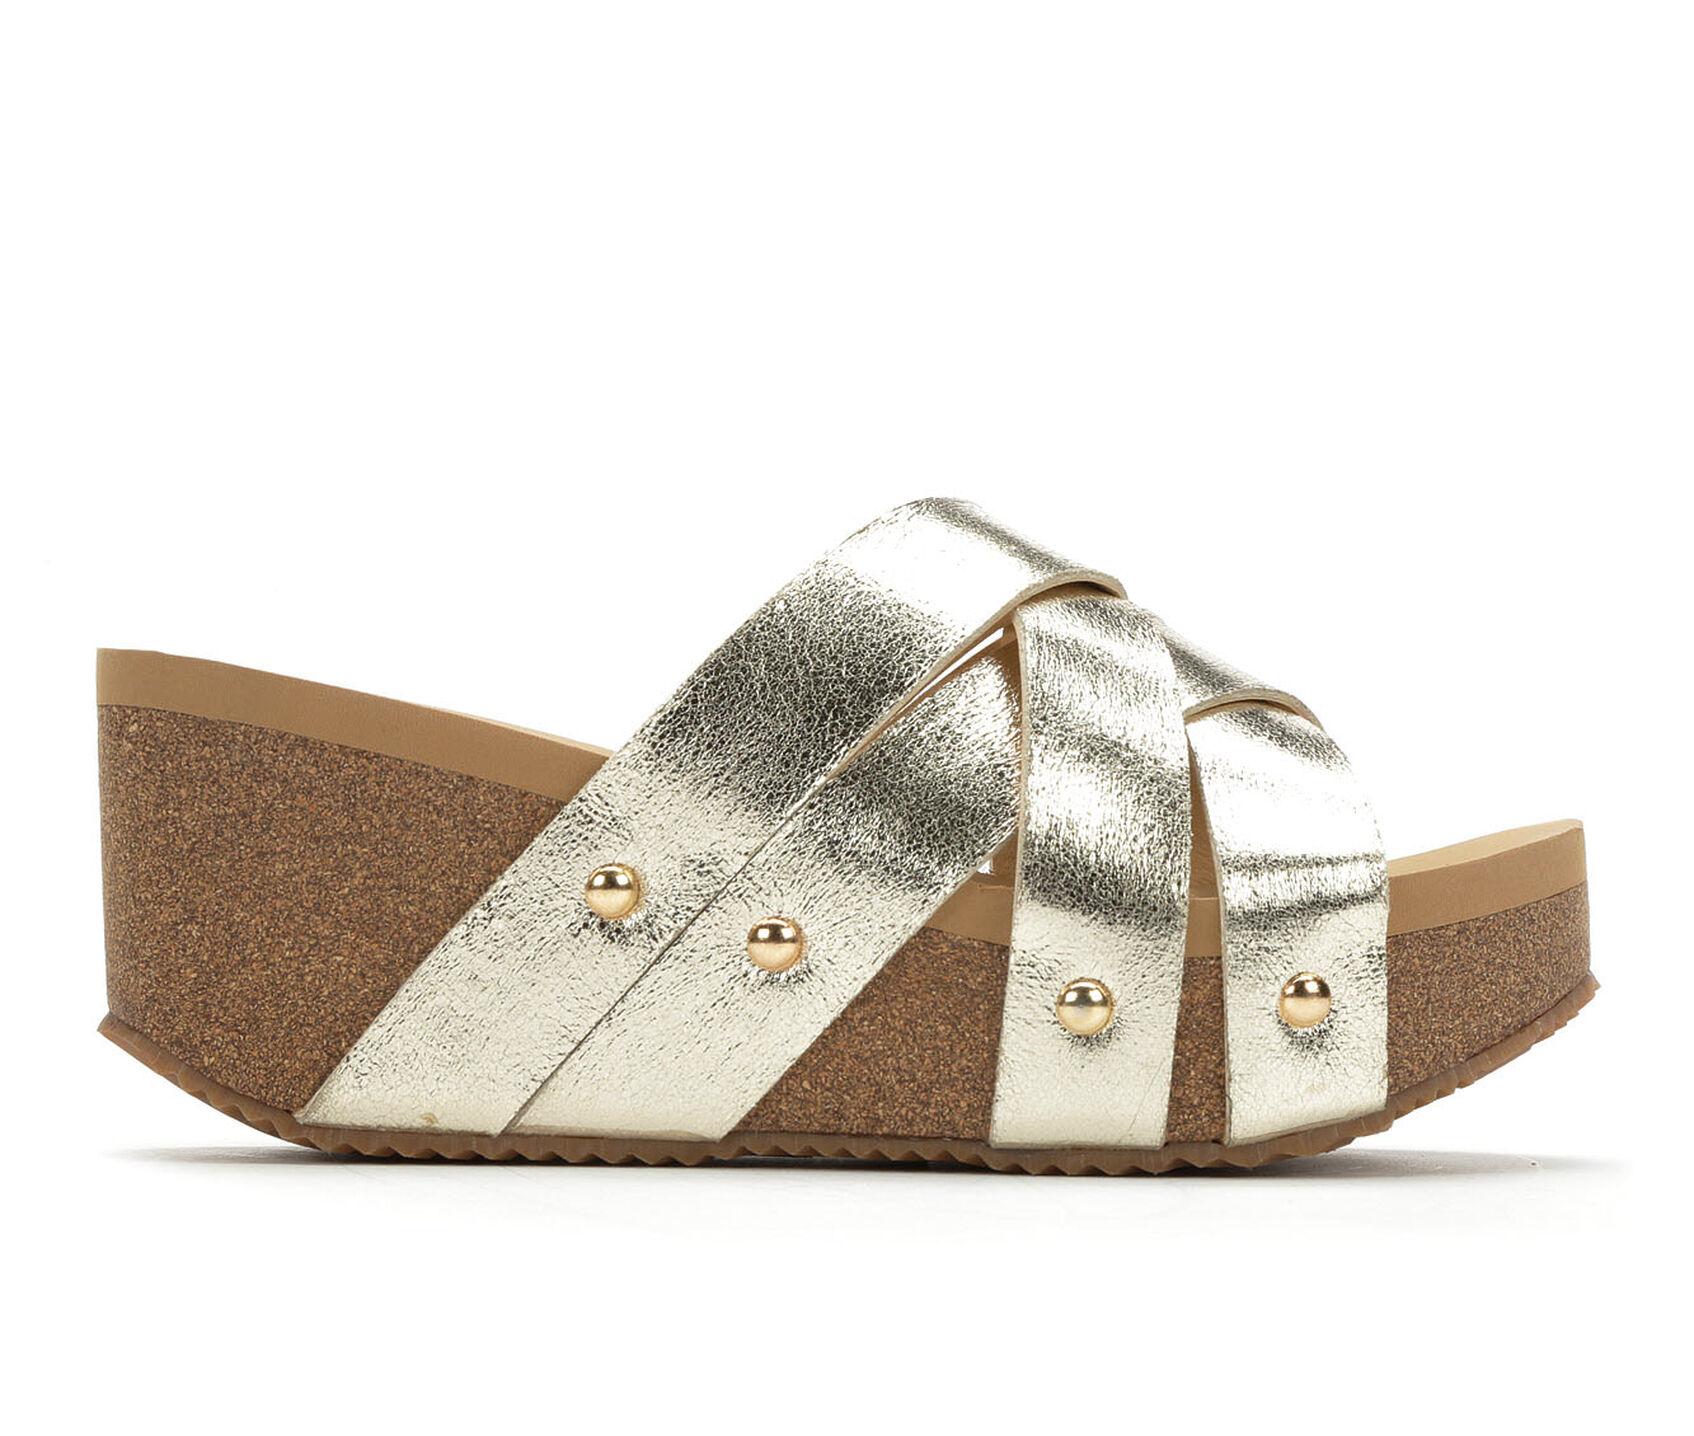 0d2a0d843e03 Women's Volatile Ethereal Platform Wedge Slide Sandals   Shoe Carnival